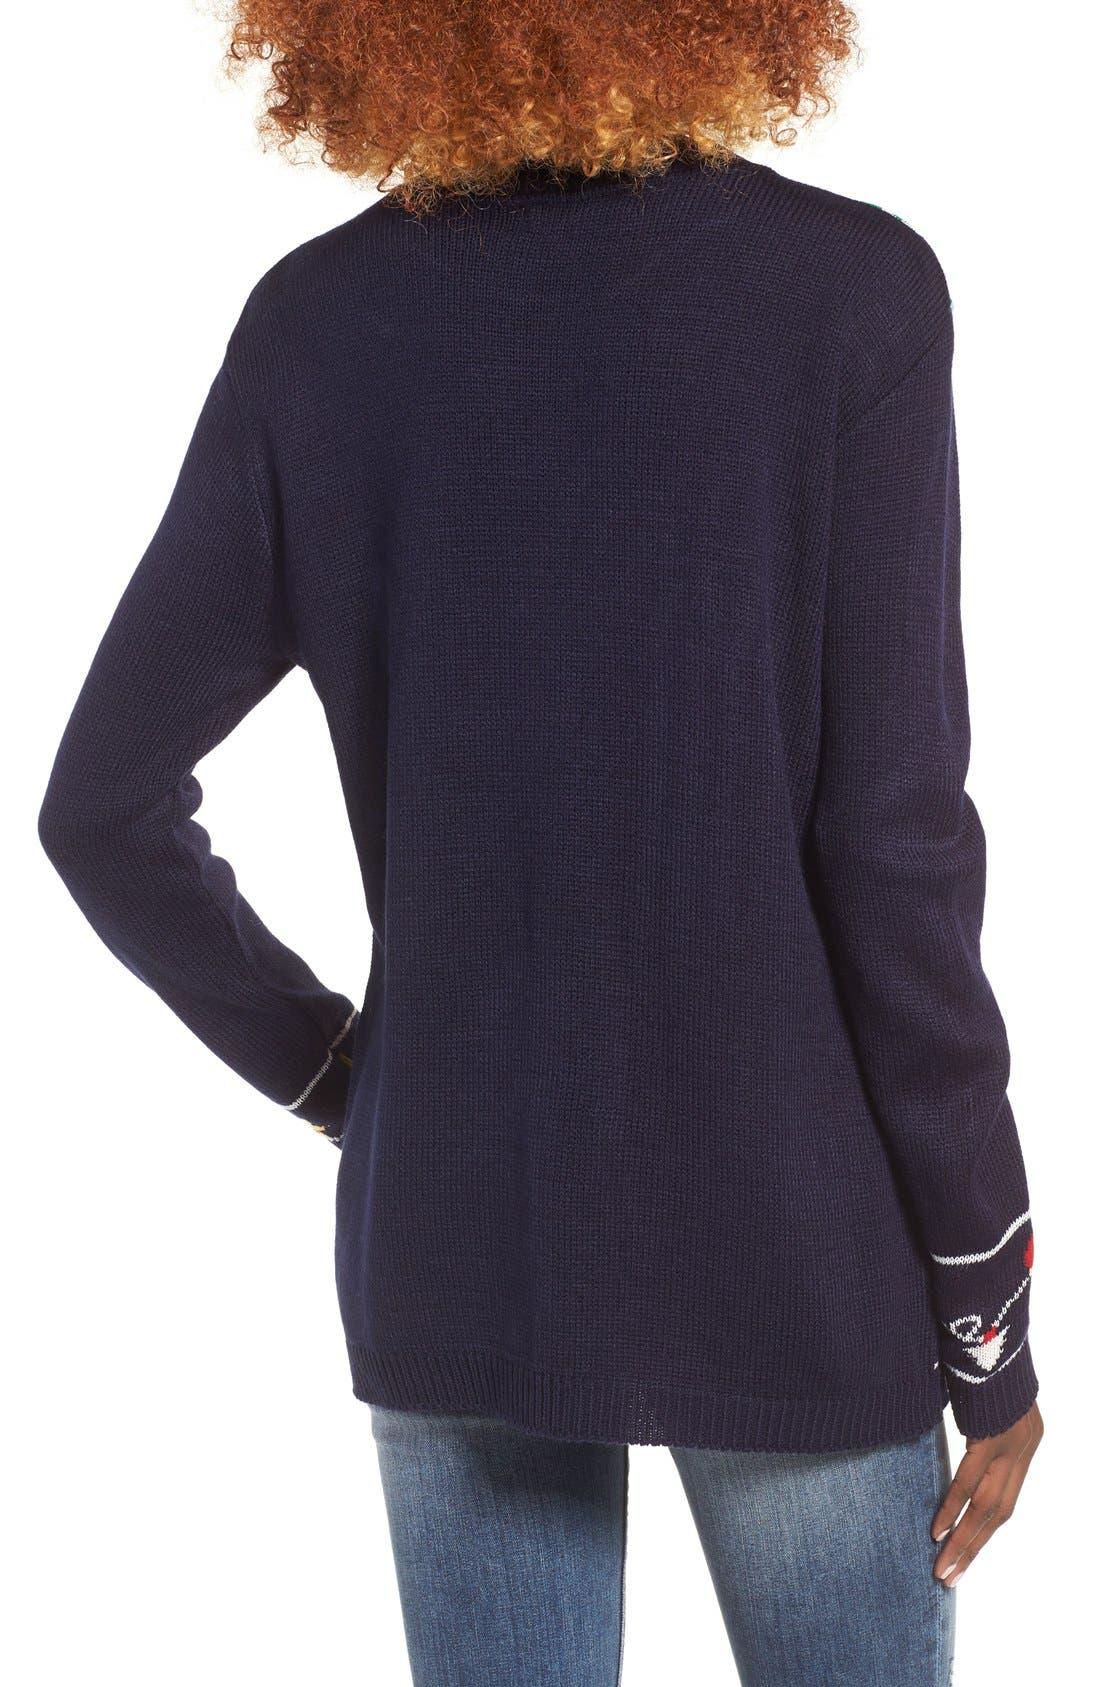 Alternate Image 2  - Cotton Emporium Ornament Christmas Sweater